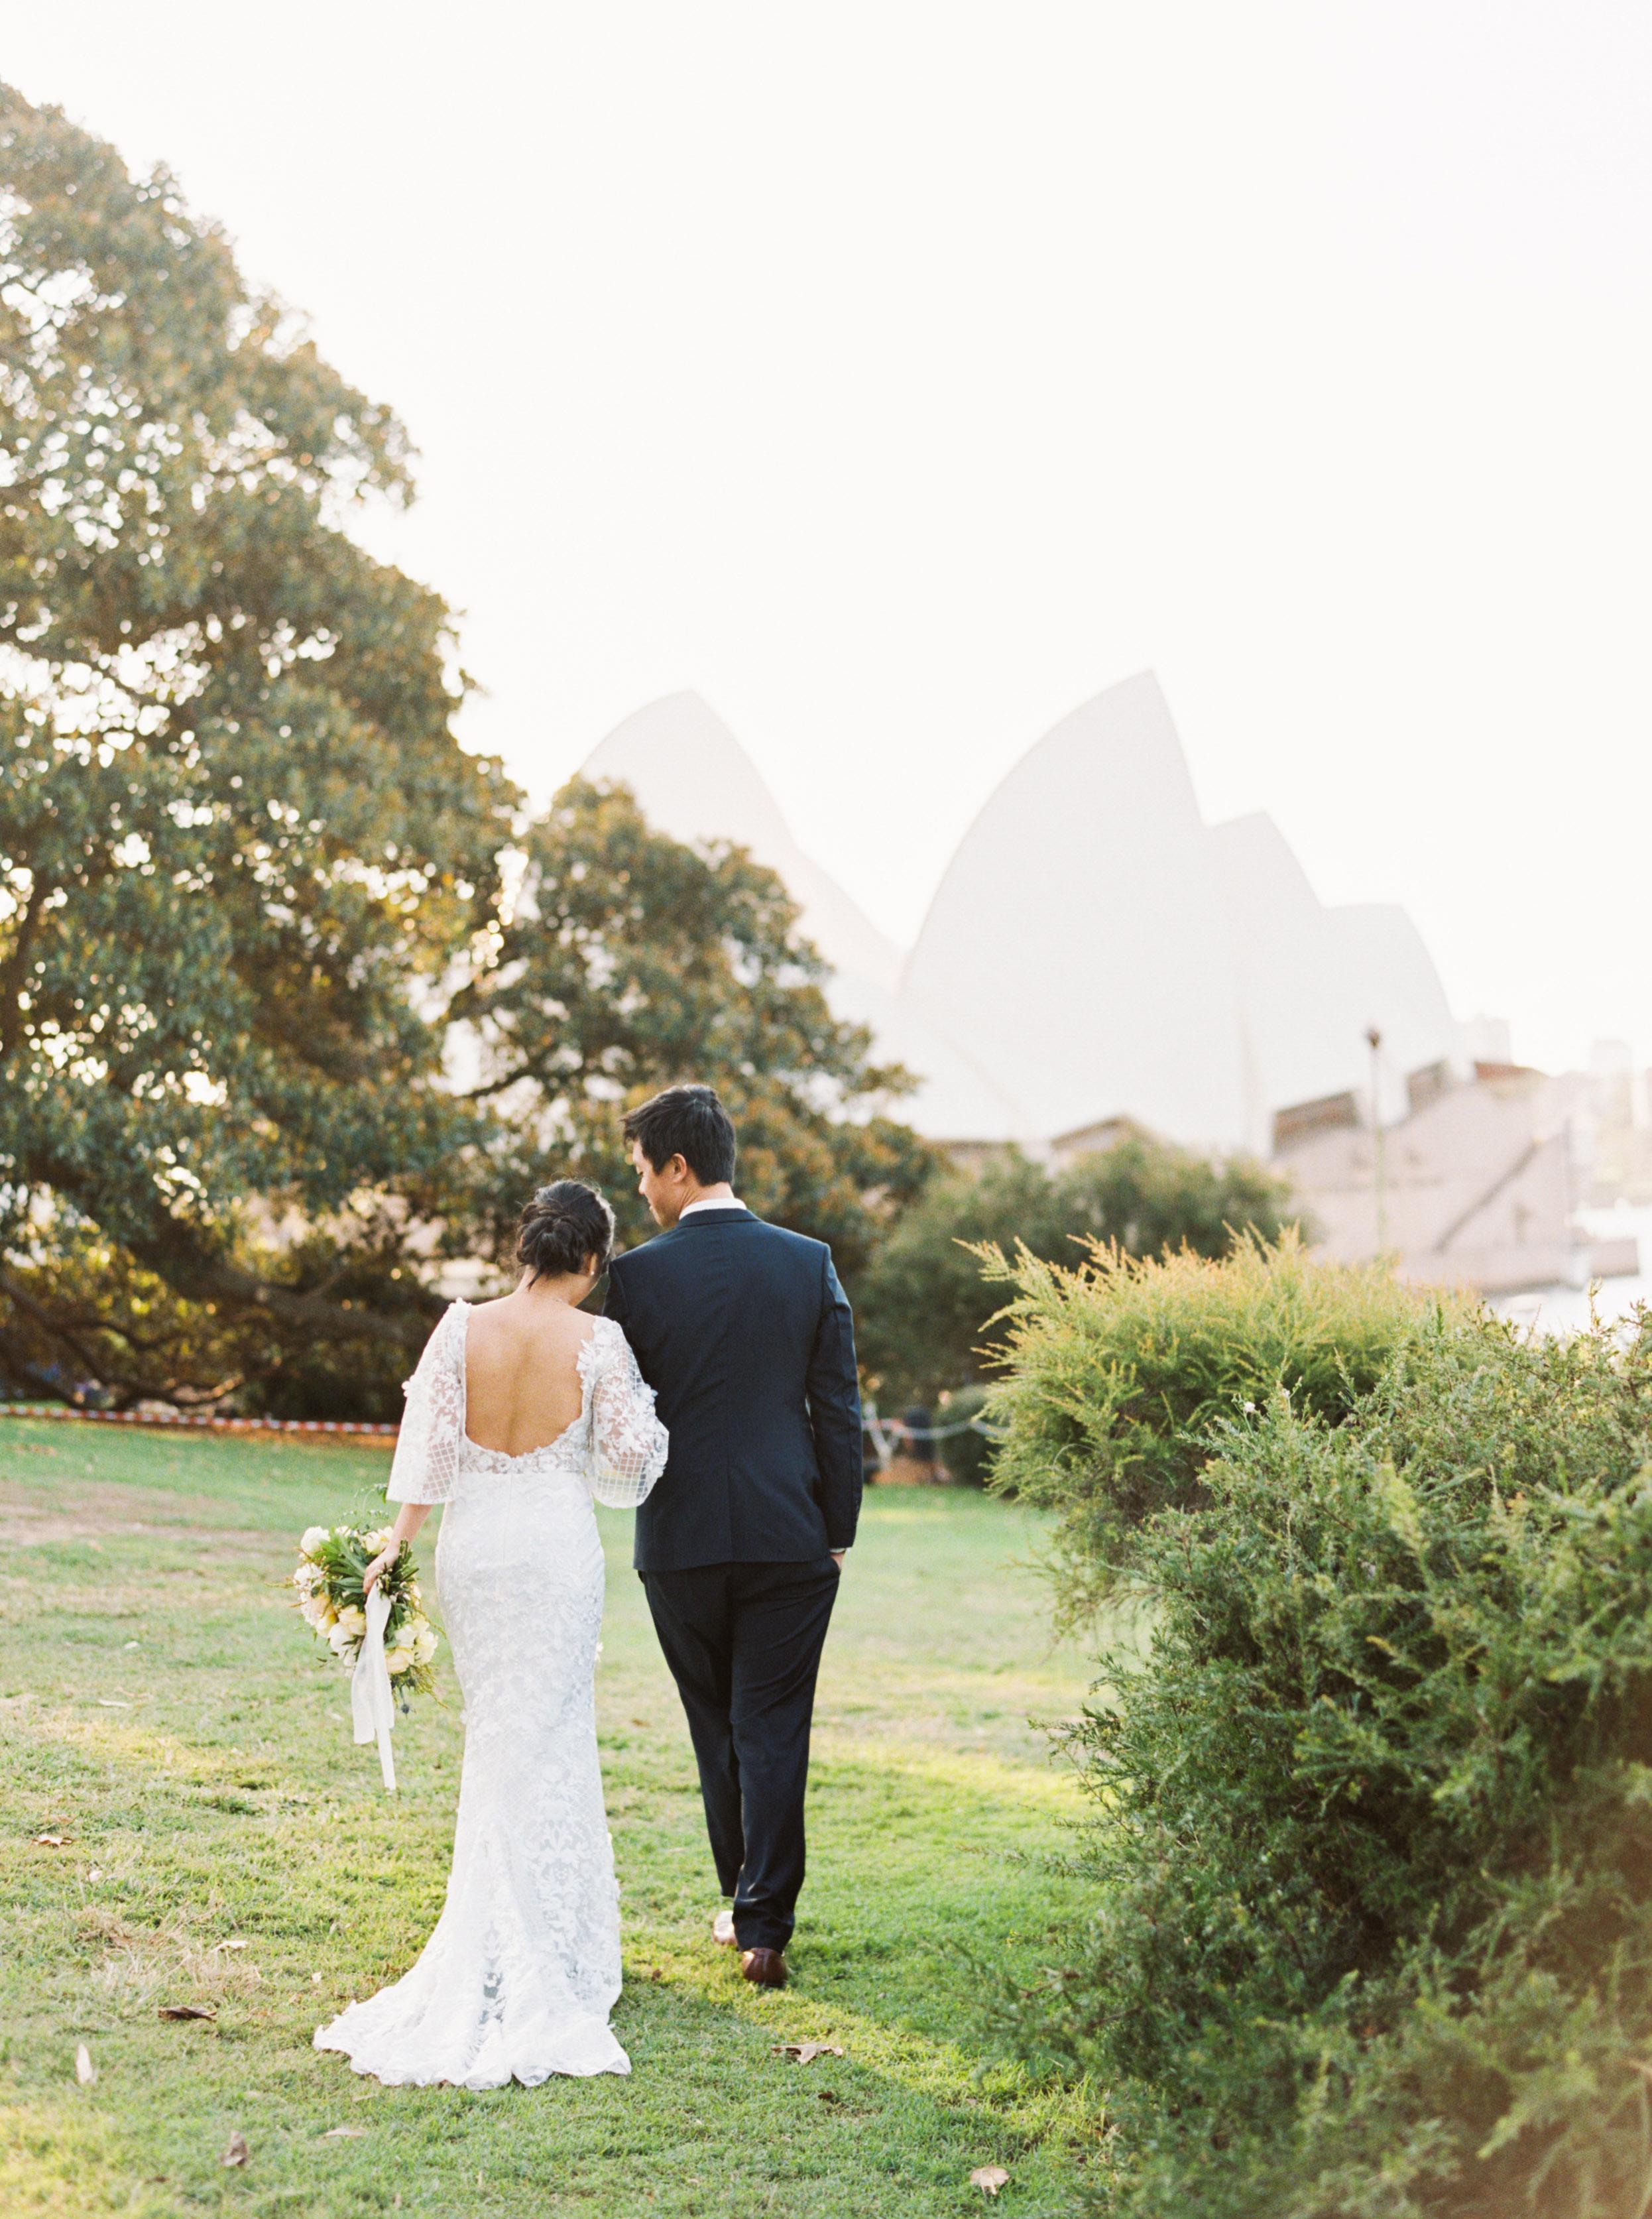 00015- Australia Sydney Wedding Photographer Sheri McMahon.jpg